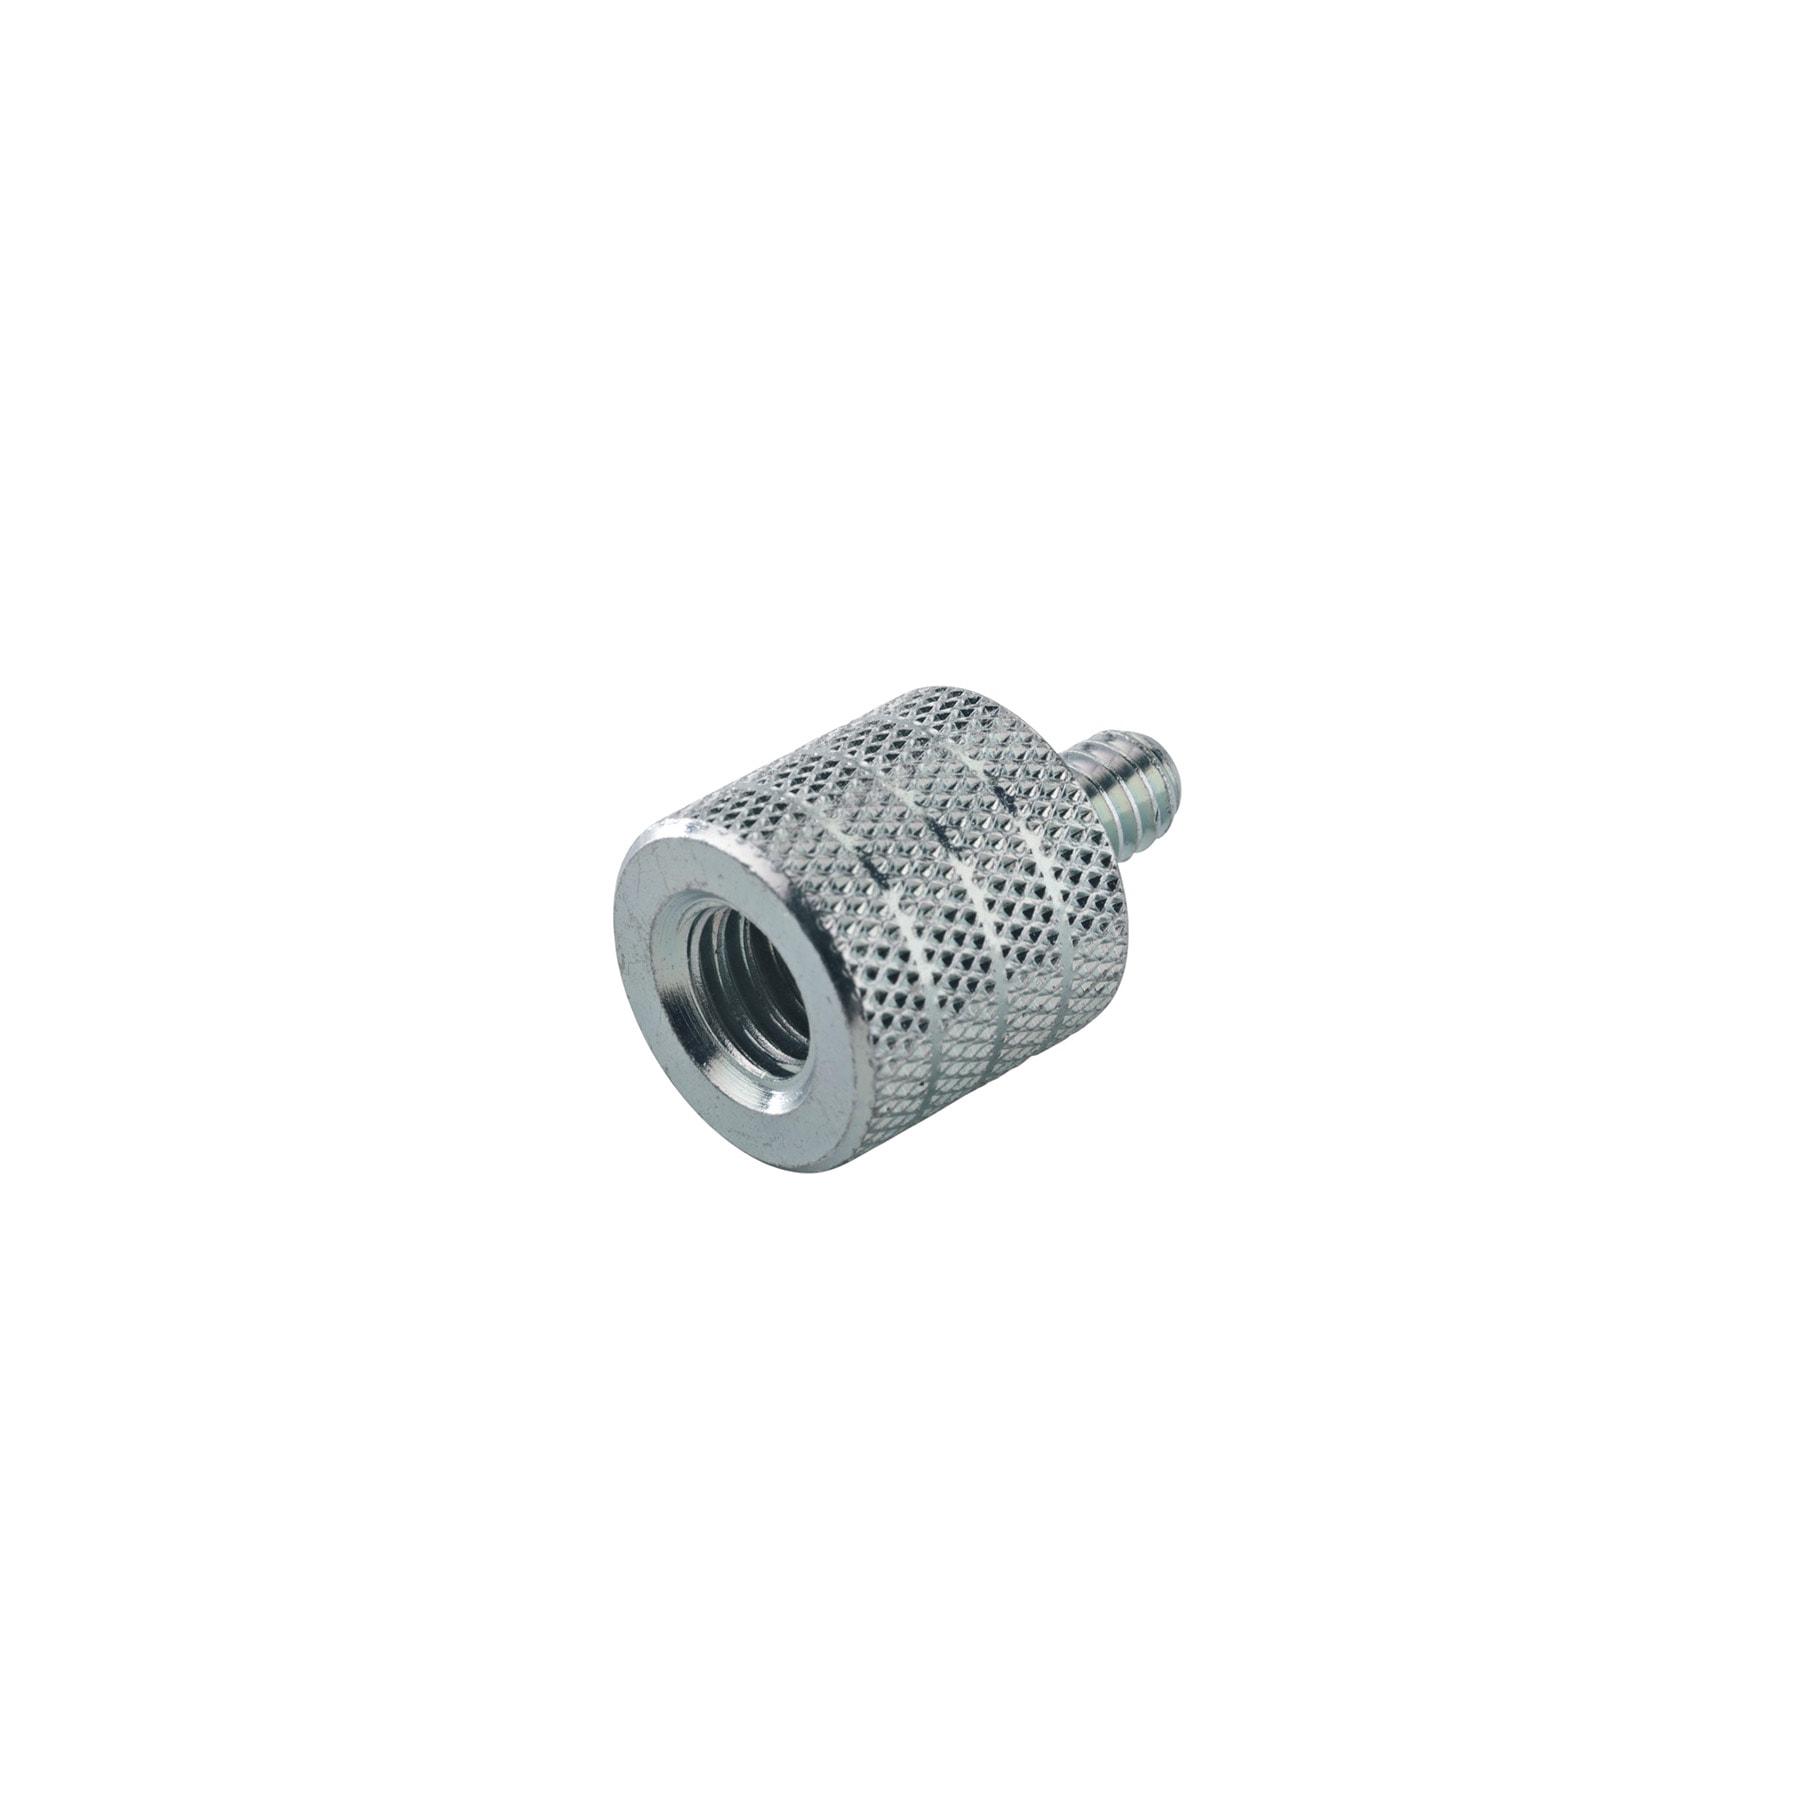 KM21920 - Thread adapter